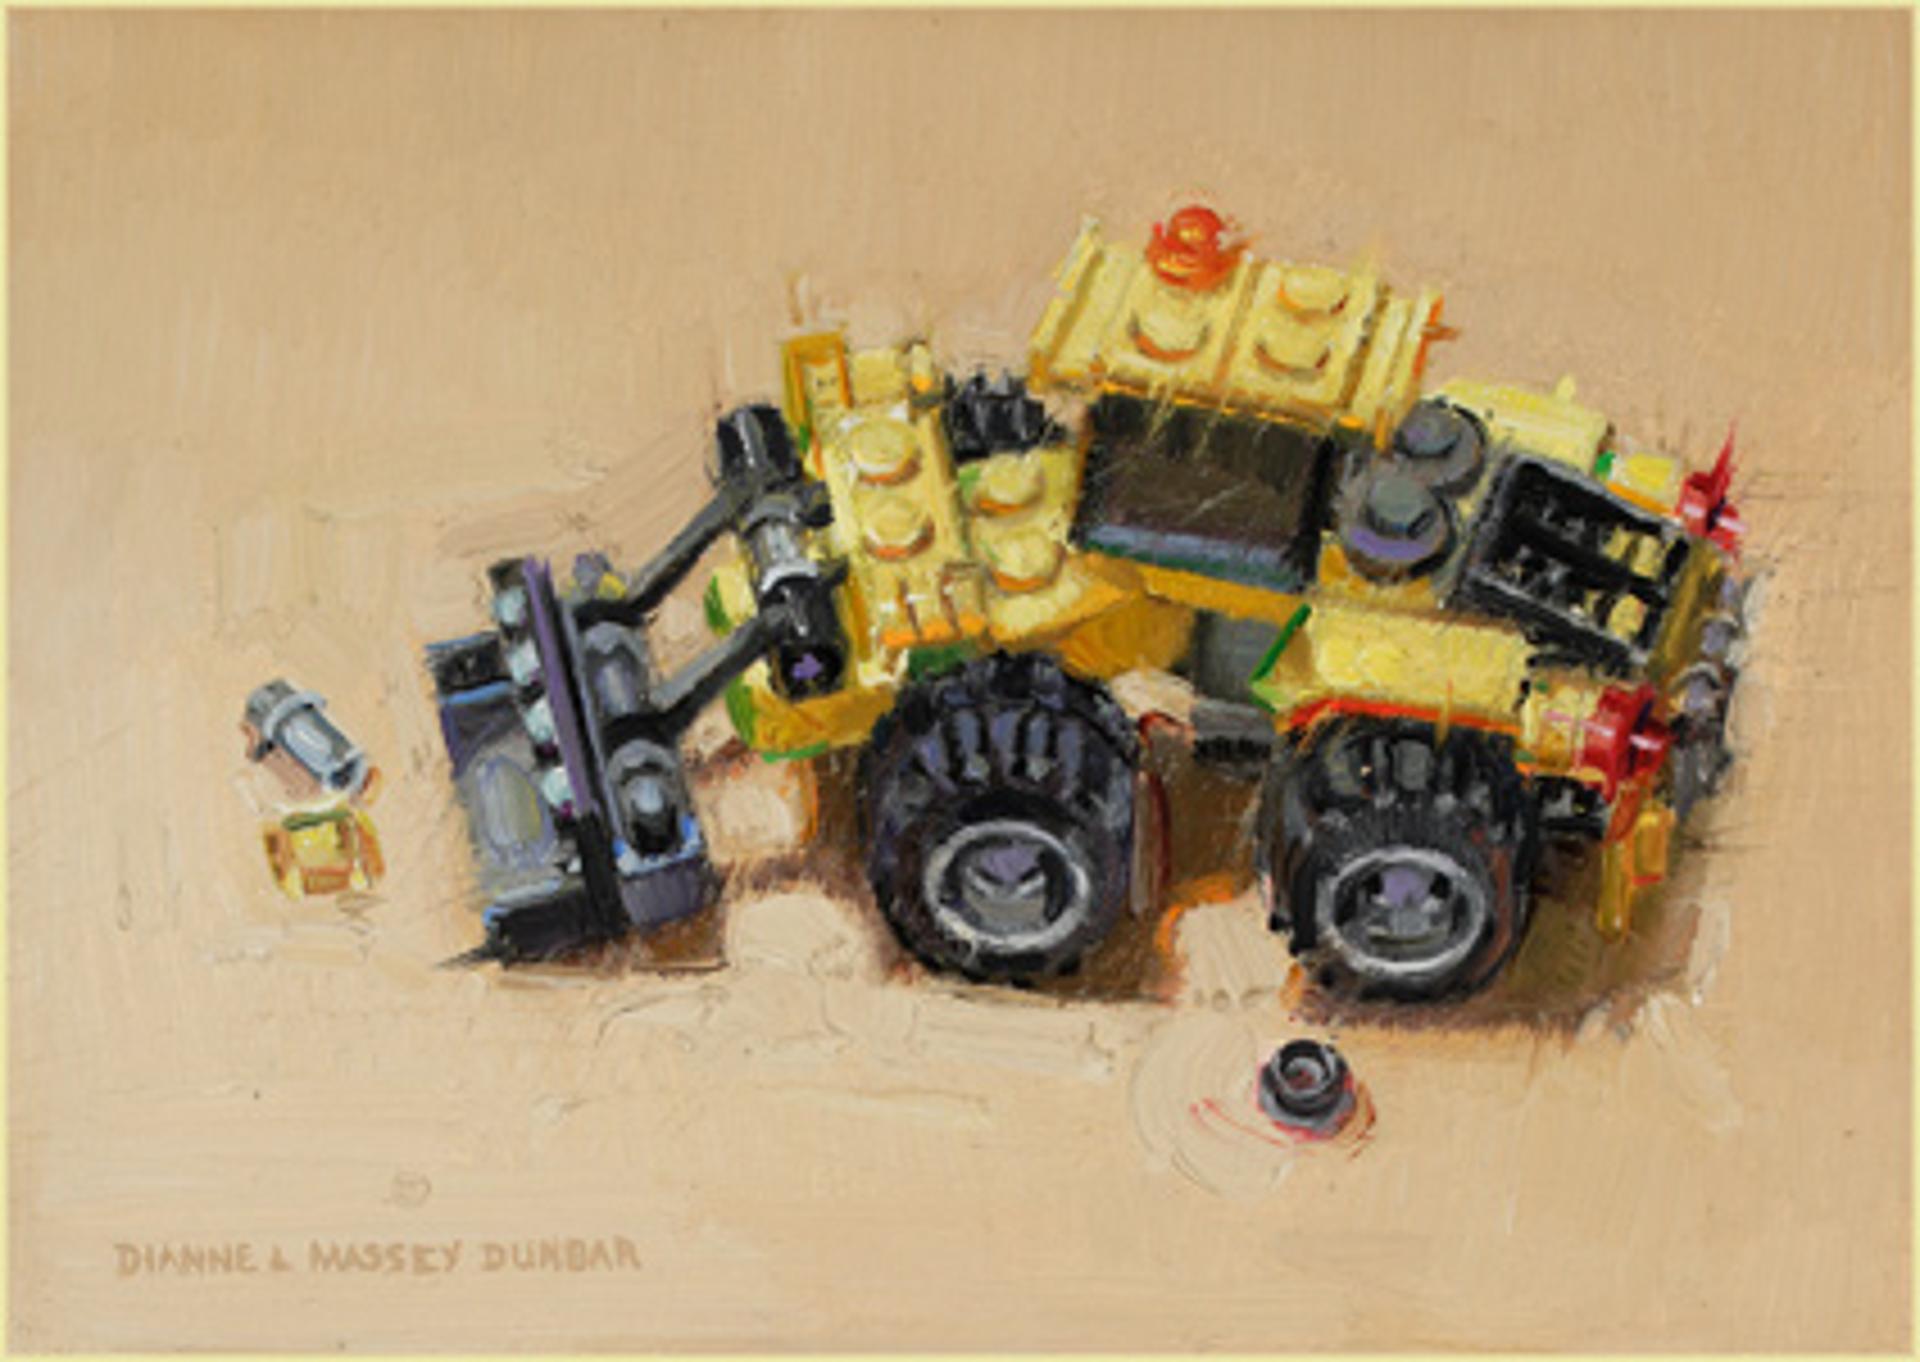 Yellow Digger by Dianne L Massey Dunbar